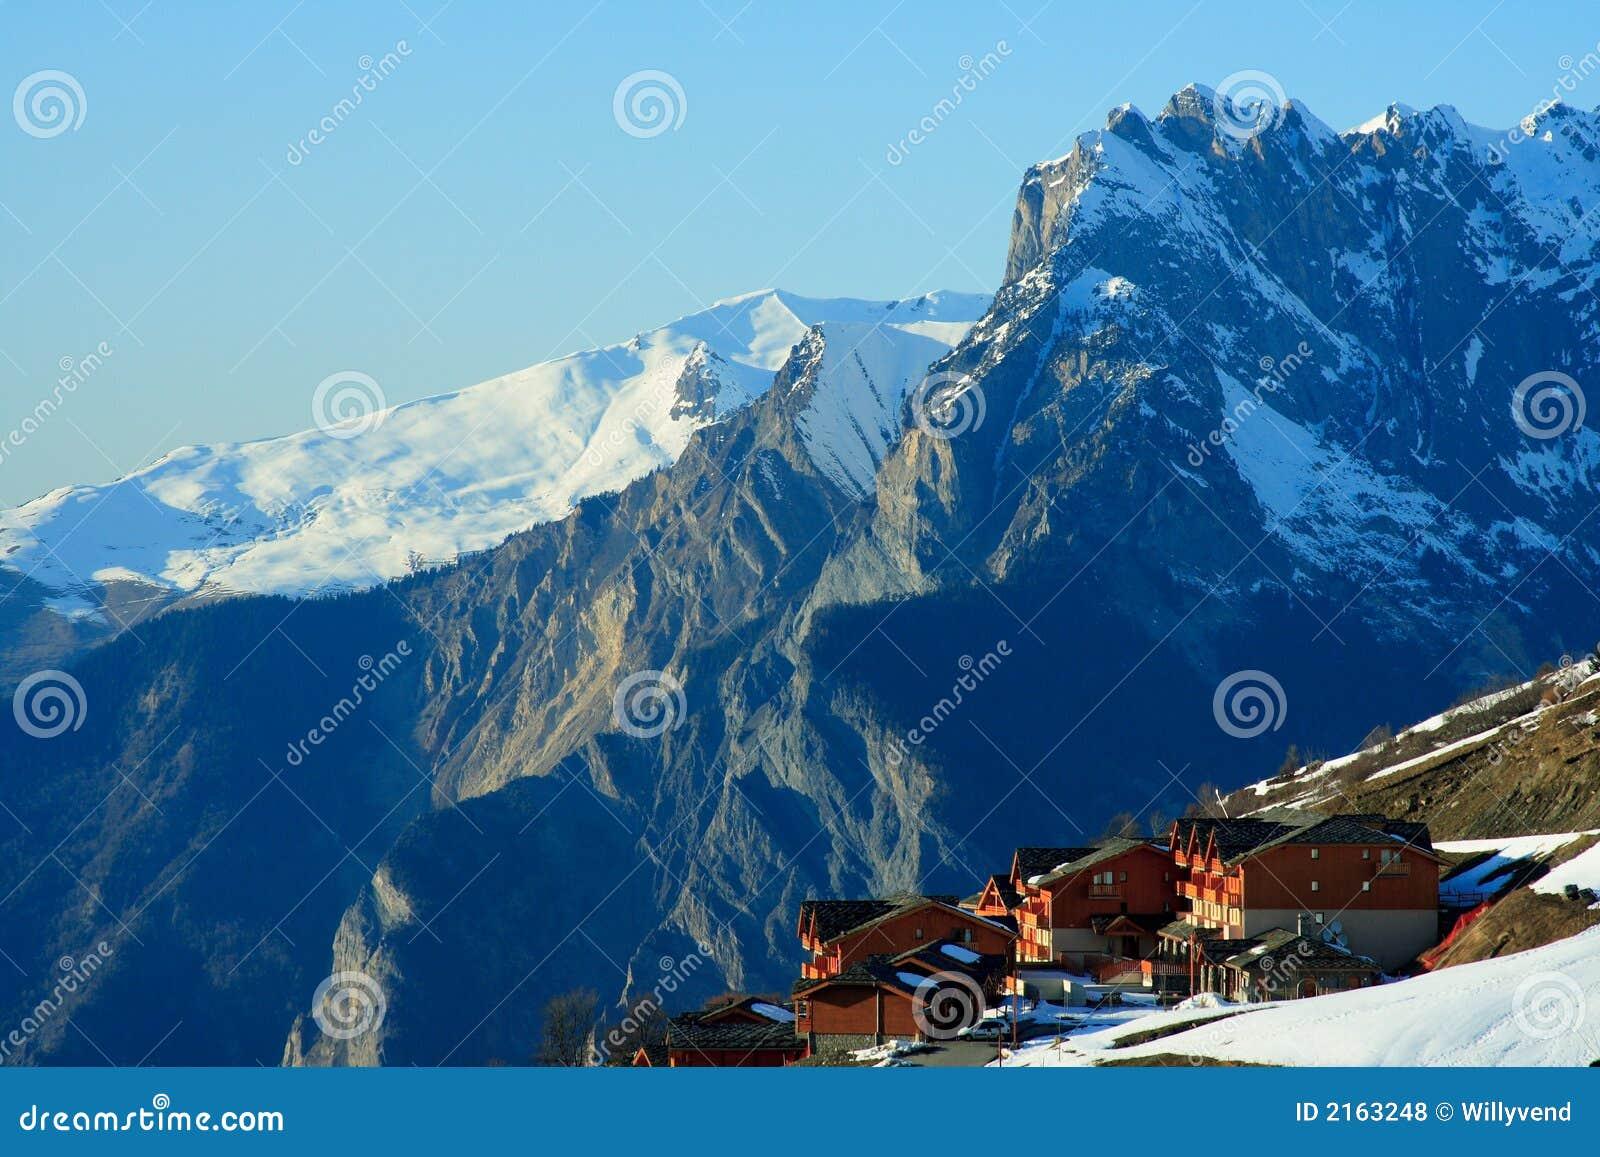 nice ski resort stock photo. image of blue, resort, chalet - 2163248